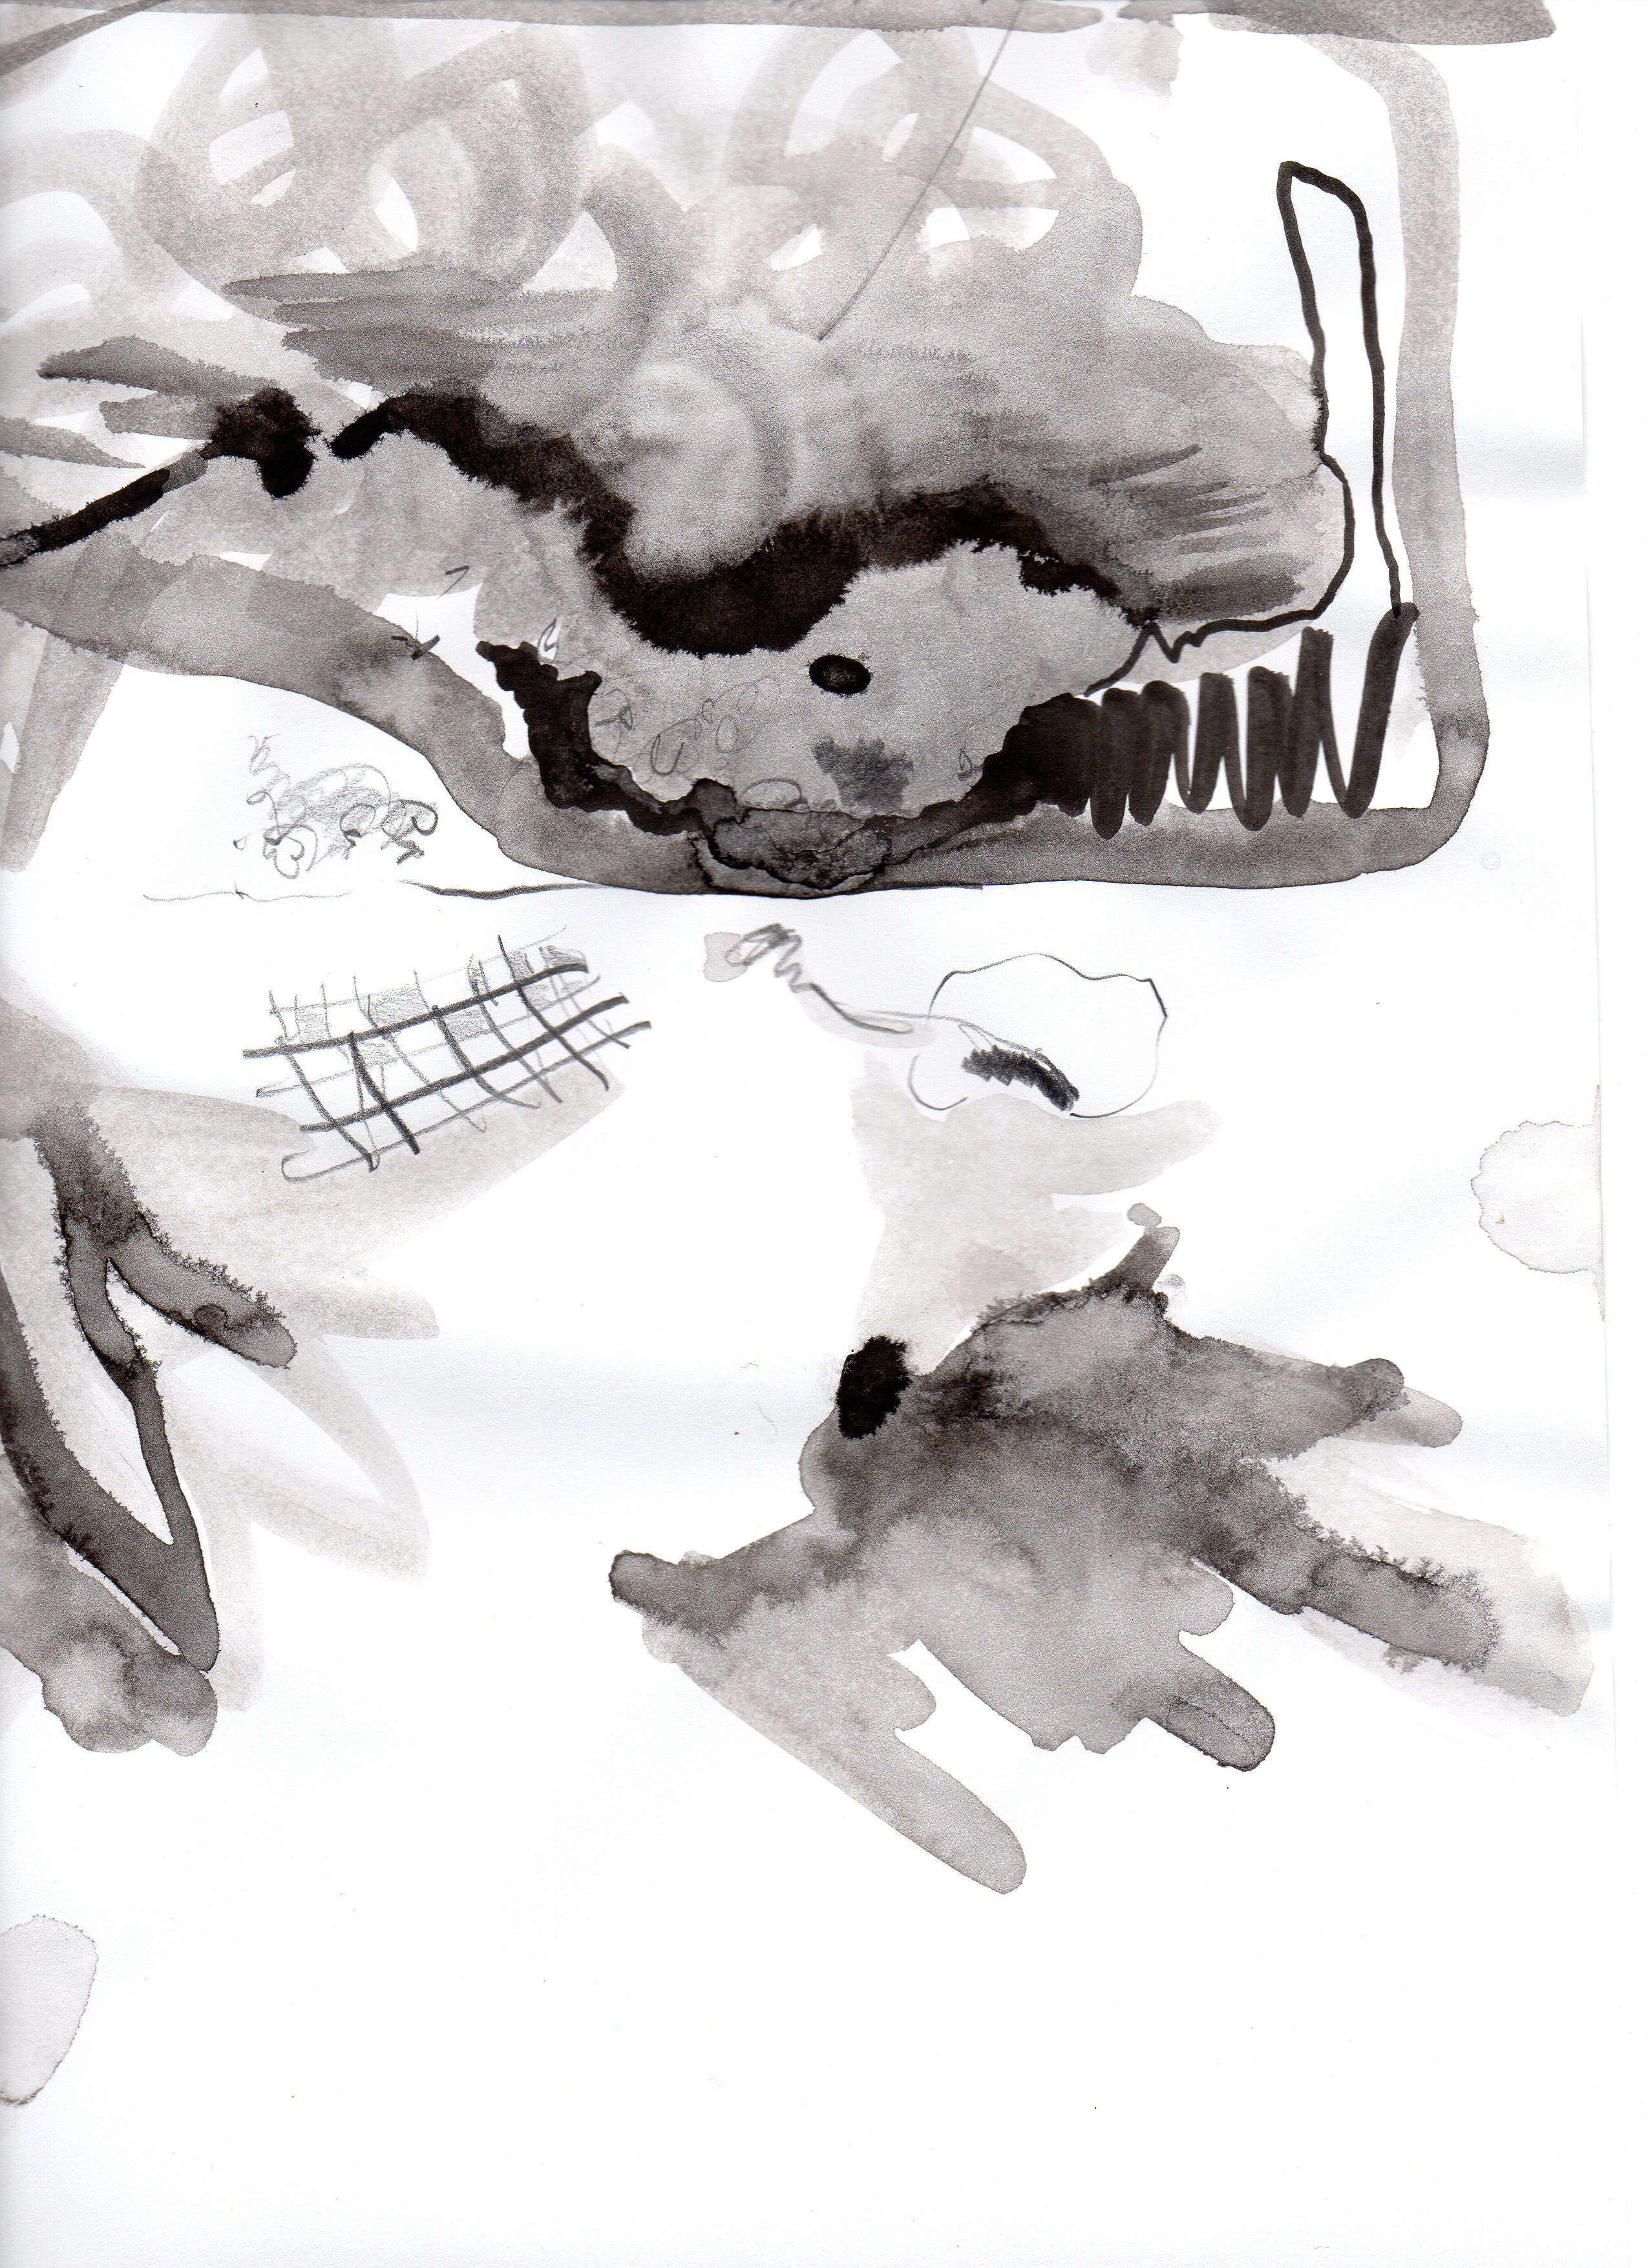 Vliegen - potlood en inkt op papier - Suzanne Bodde 2016